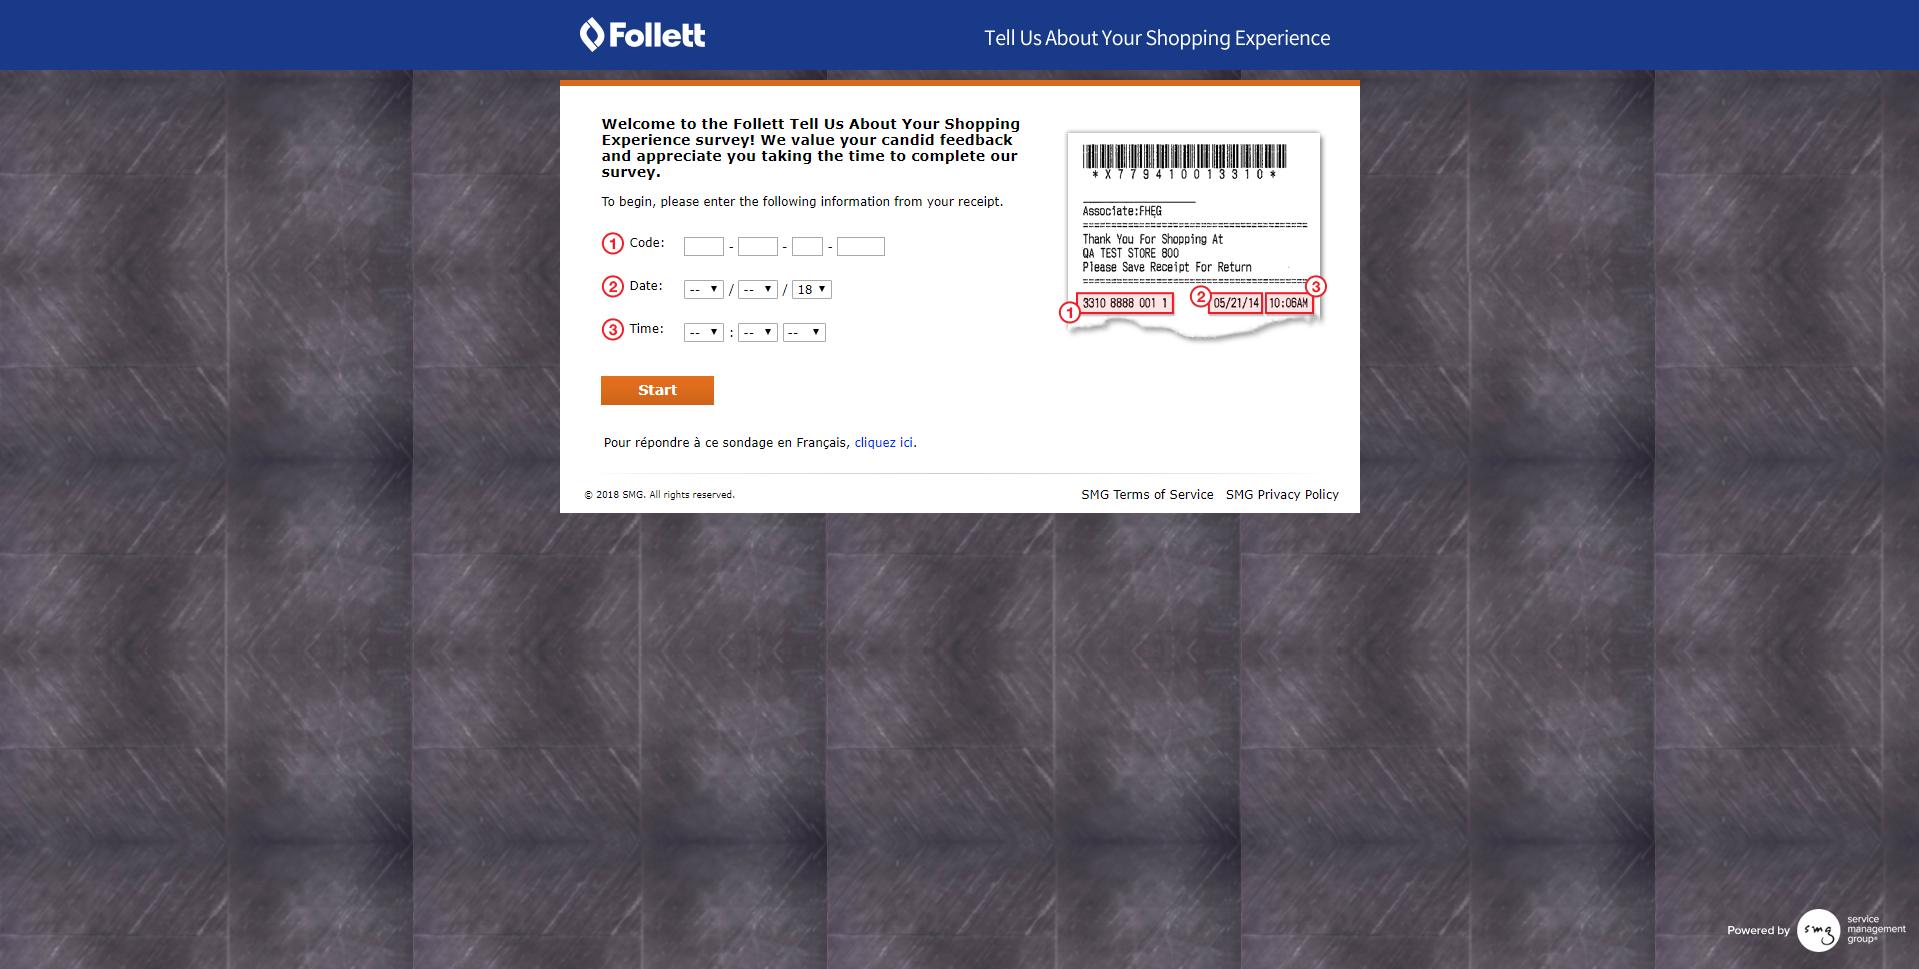 www.follettexperience.com